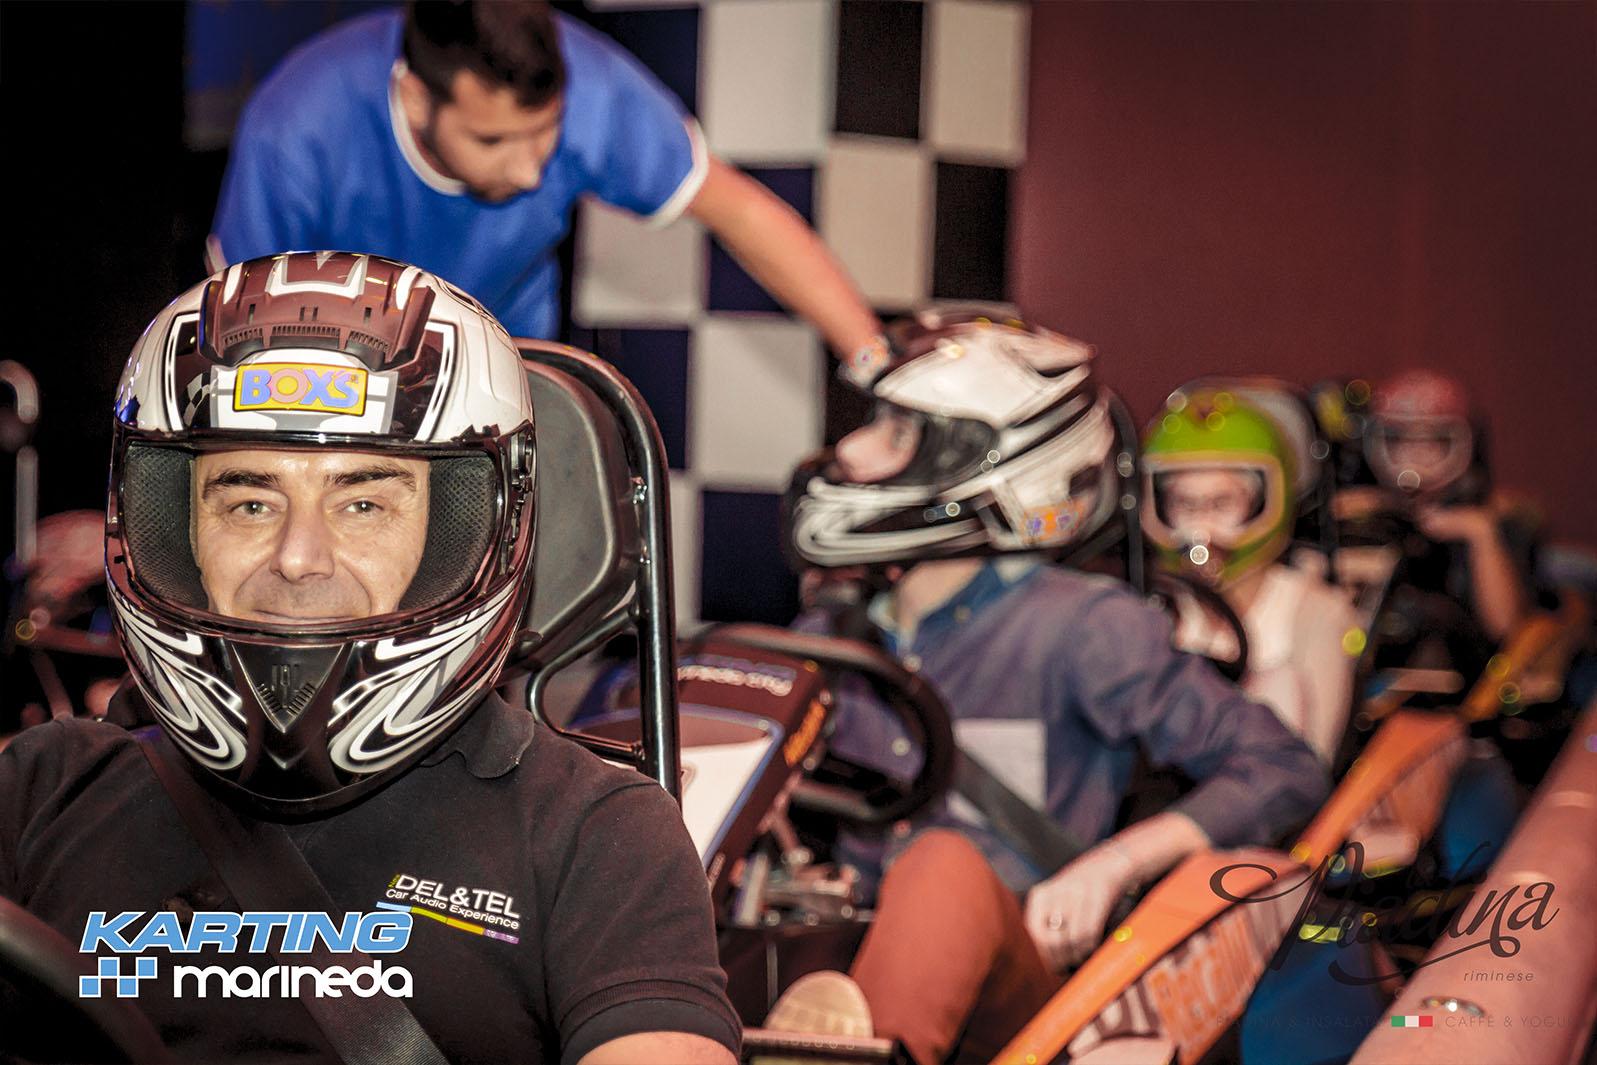 Fiesta Karting Marineda + Piadina